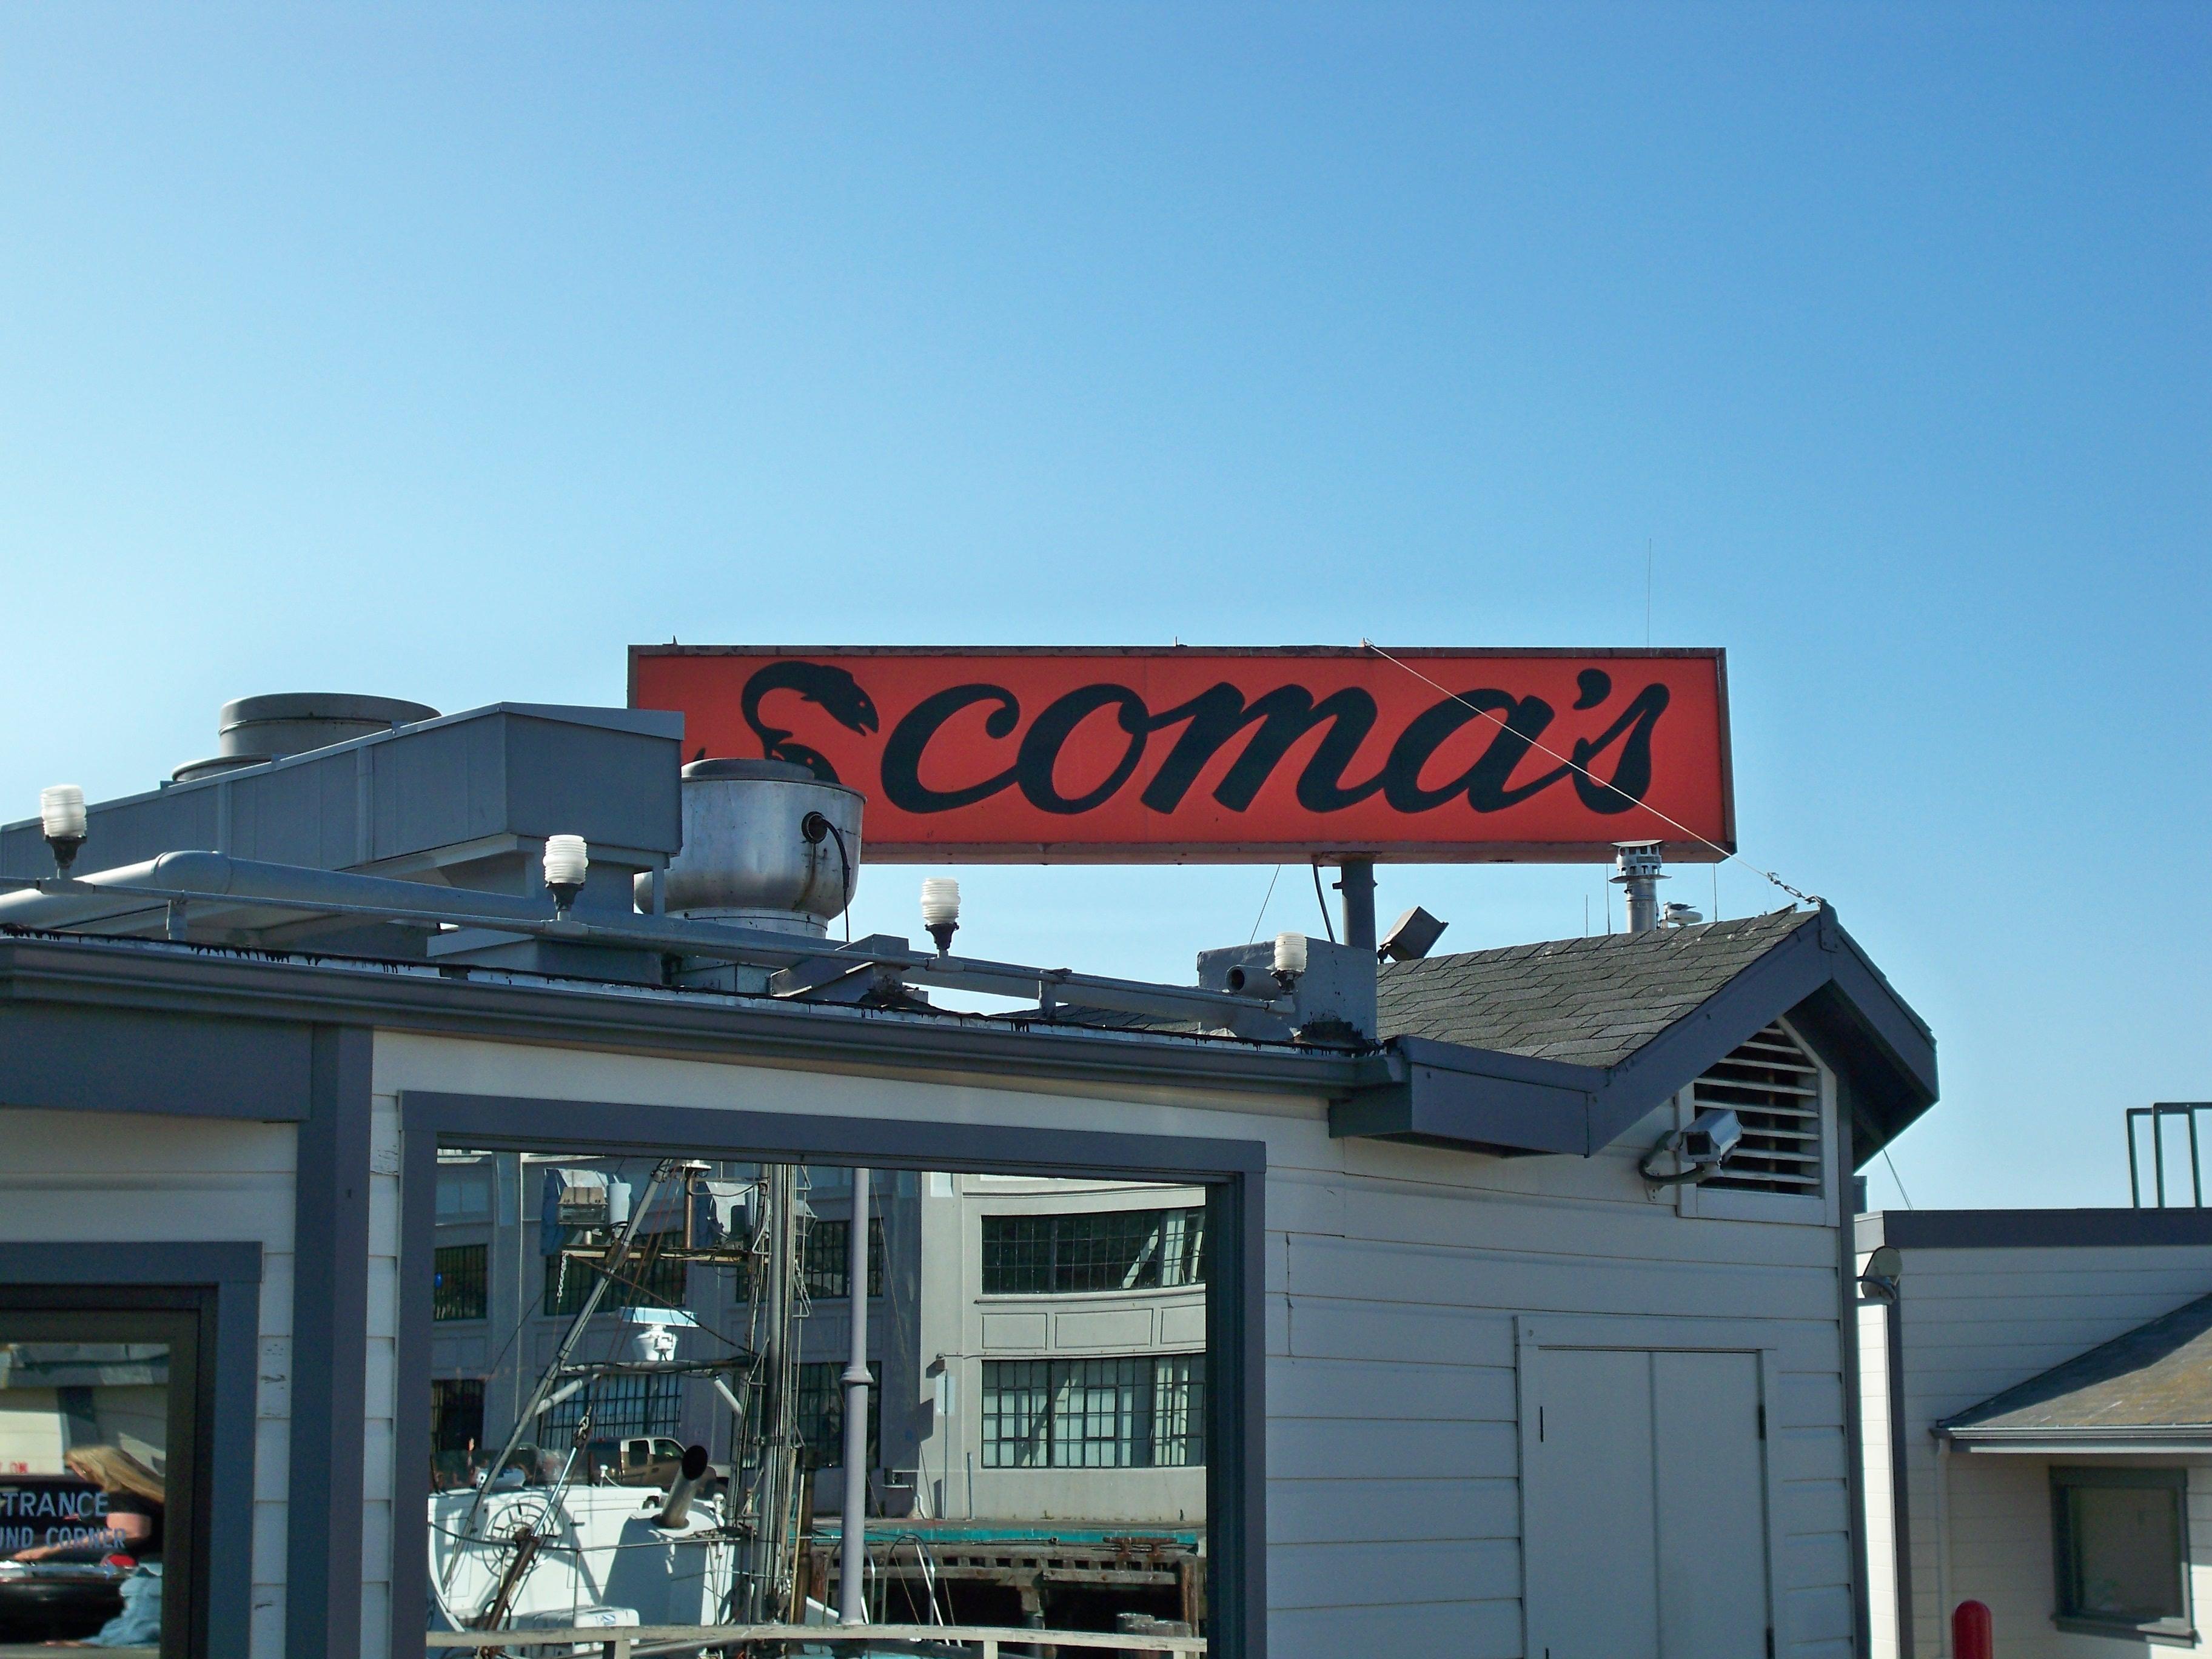 Scoma's Seafood Restaurant, Fisherman's Wharf, San Francisco